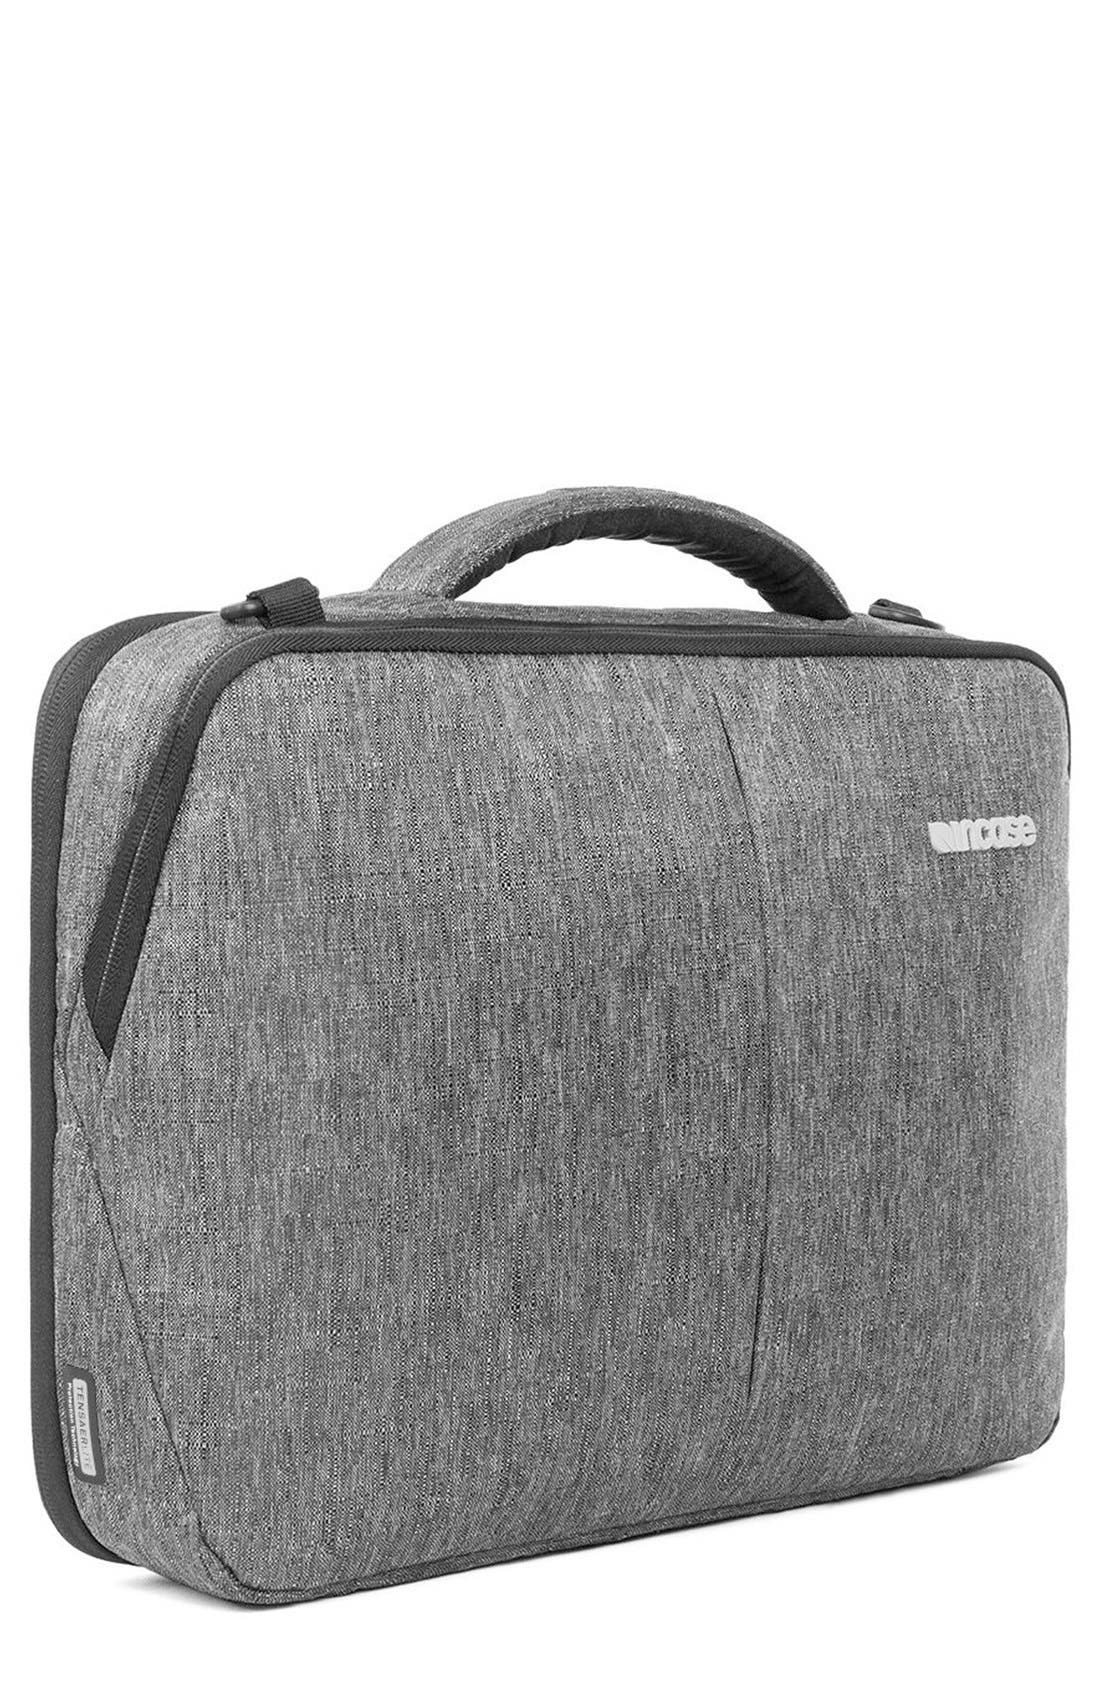 "'Reform' 15"" Laptop Briefcase,                         Main,                         color, 004"